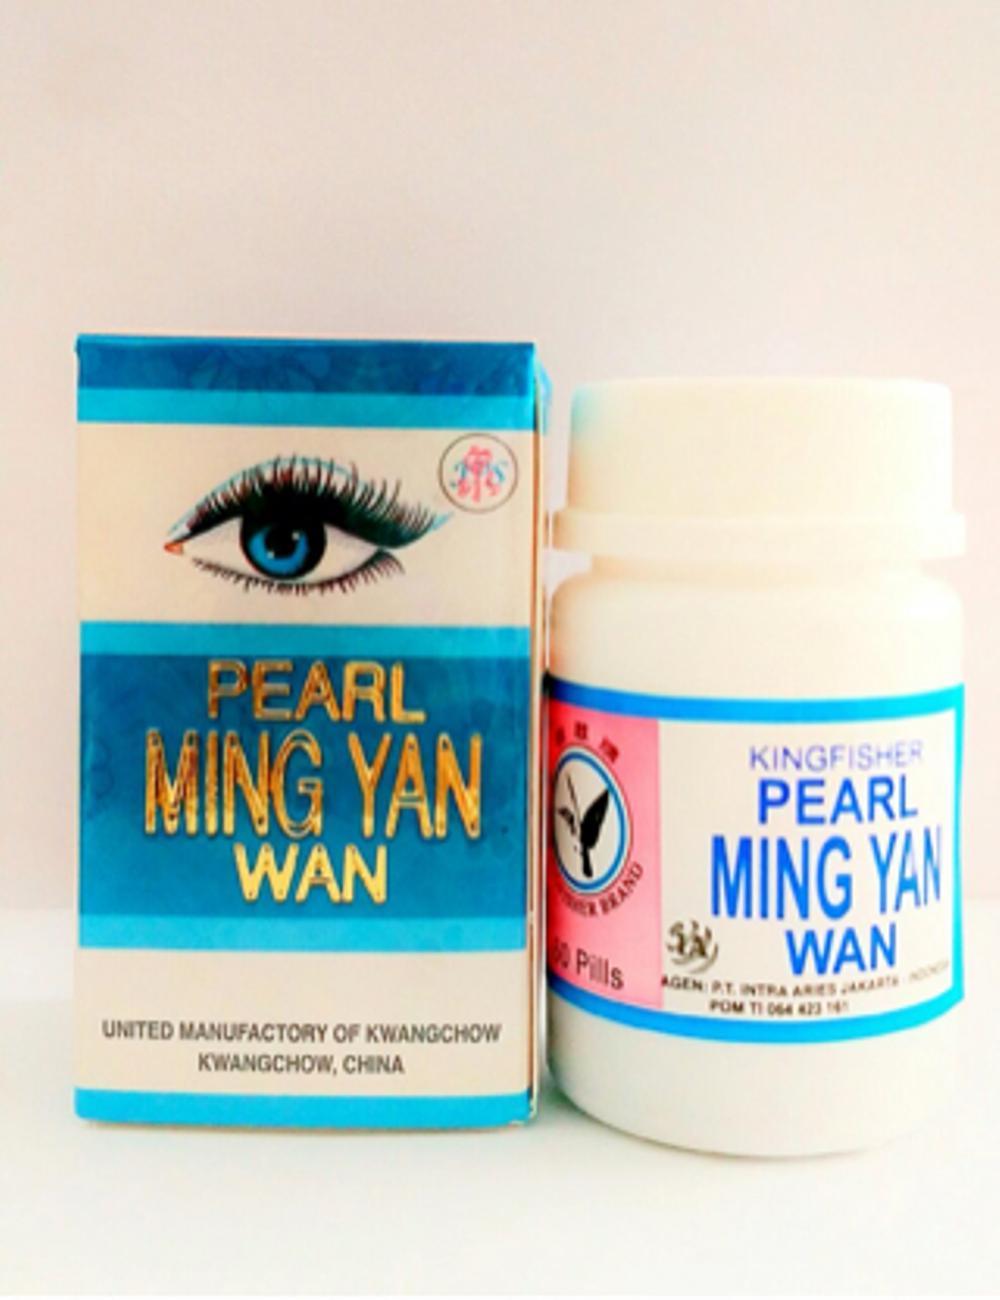 Daftar Harga Vitamin Samyun Wan Terpercaya Samyunwan Wisdom Asli Pearl Ming Yan Obat Sakit Mata Minus Di Lapak Hj Farida Hanim Hjfaridahanim